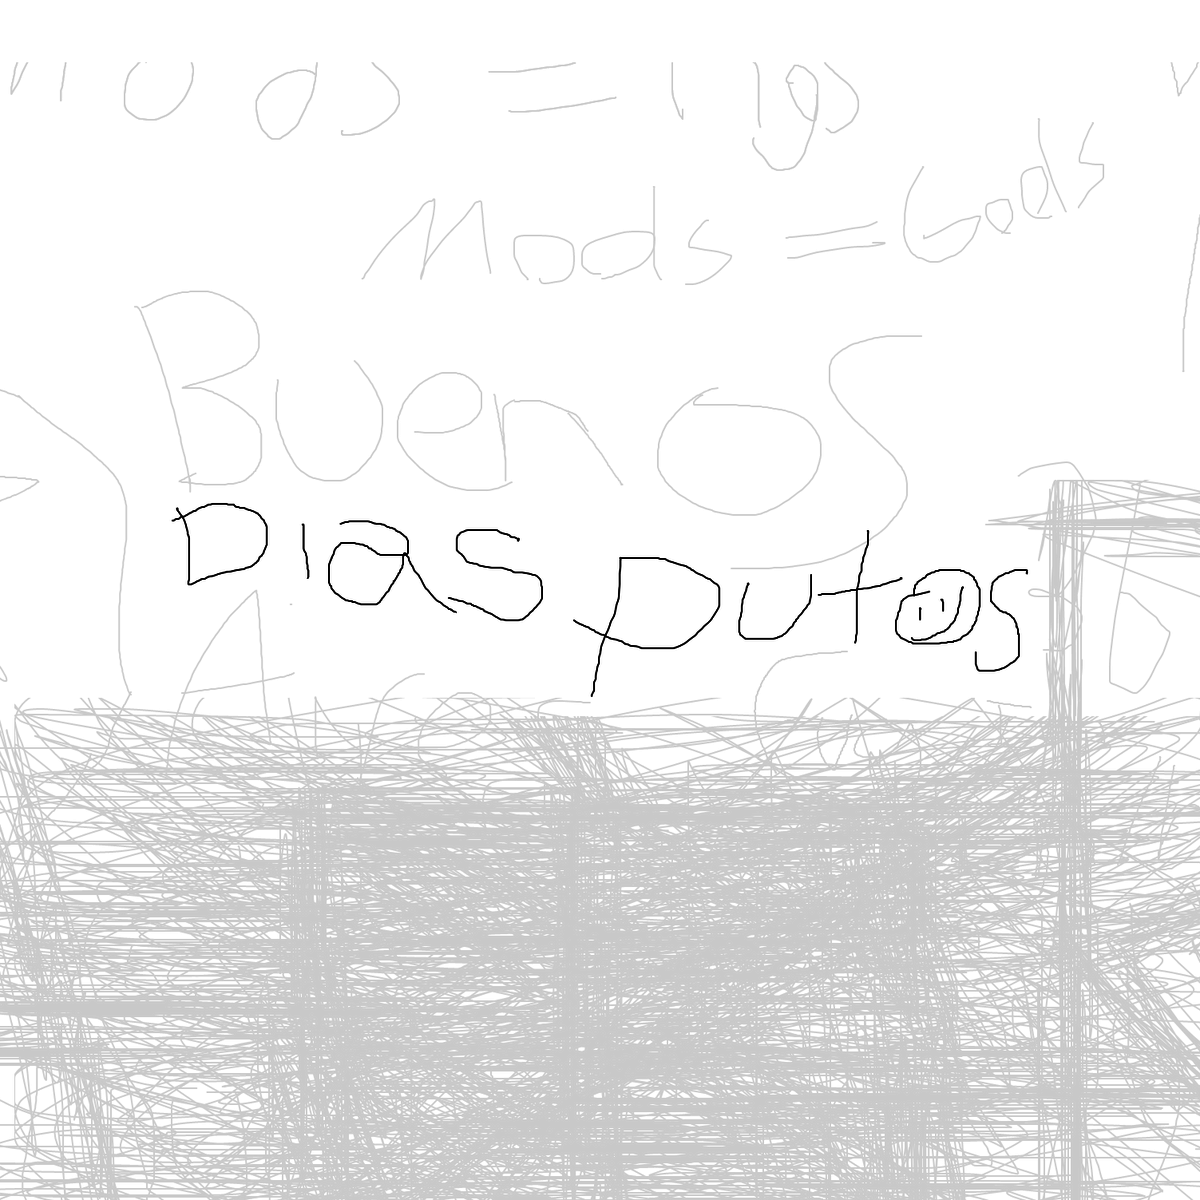 BAAAM drawing#7603 lat:-12.0500297546386720lng: -51.5038795471191400